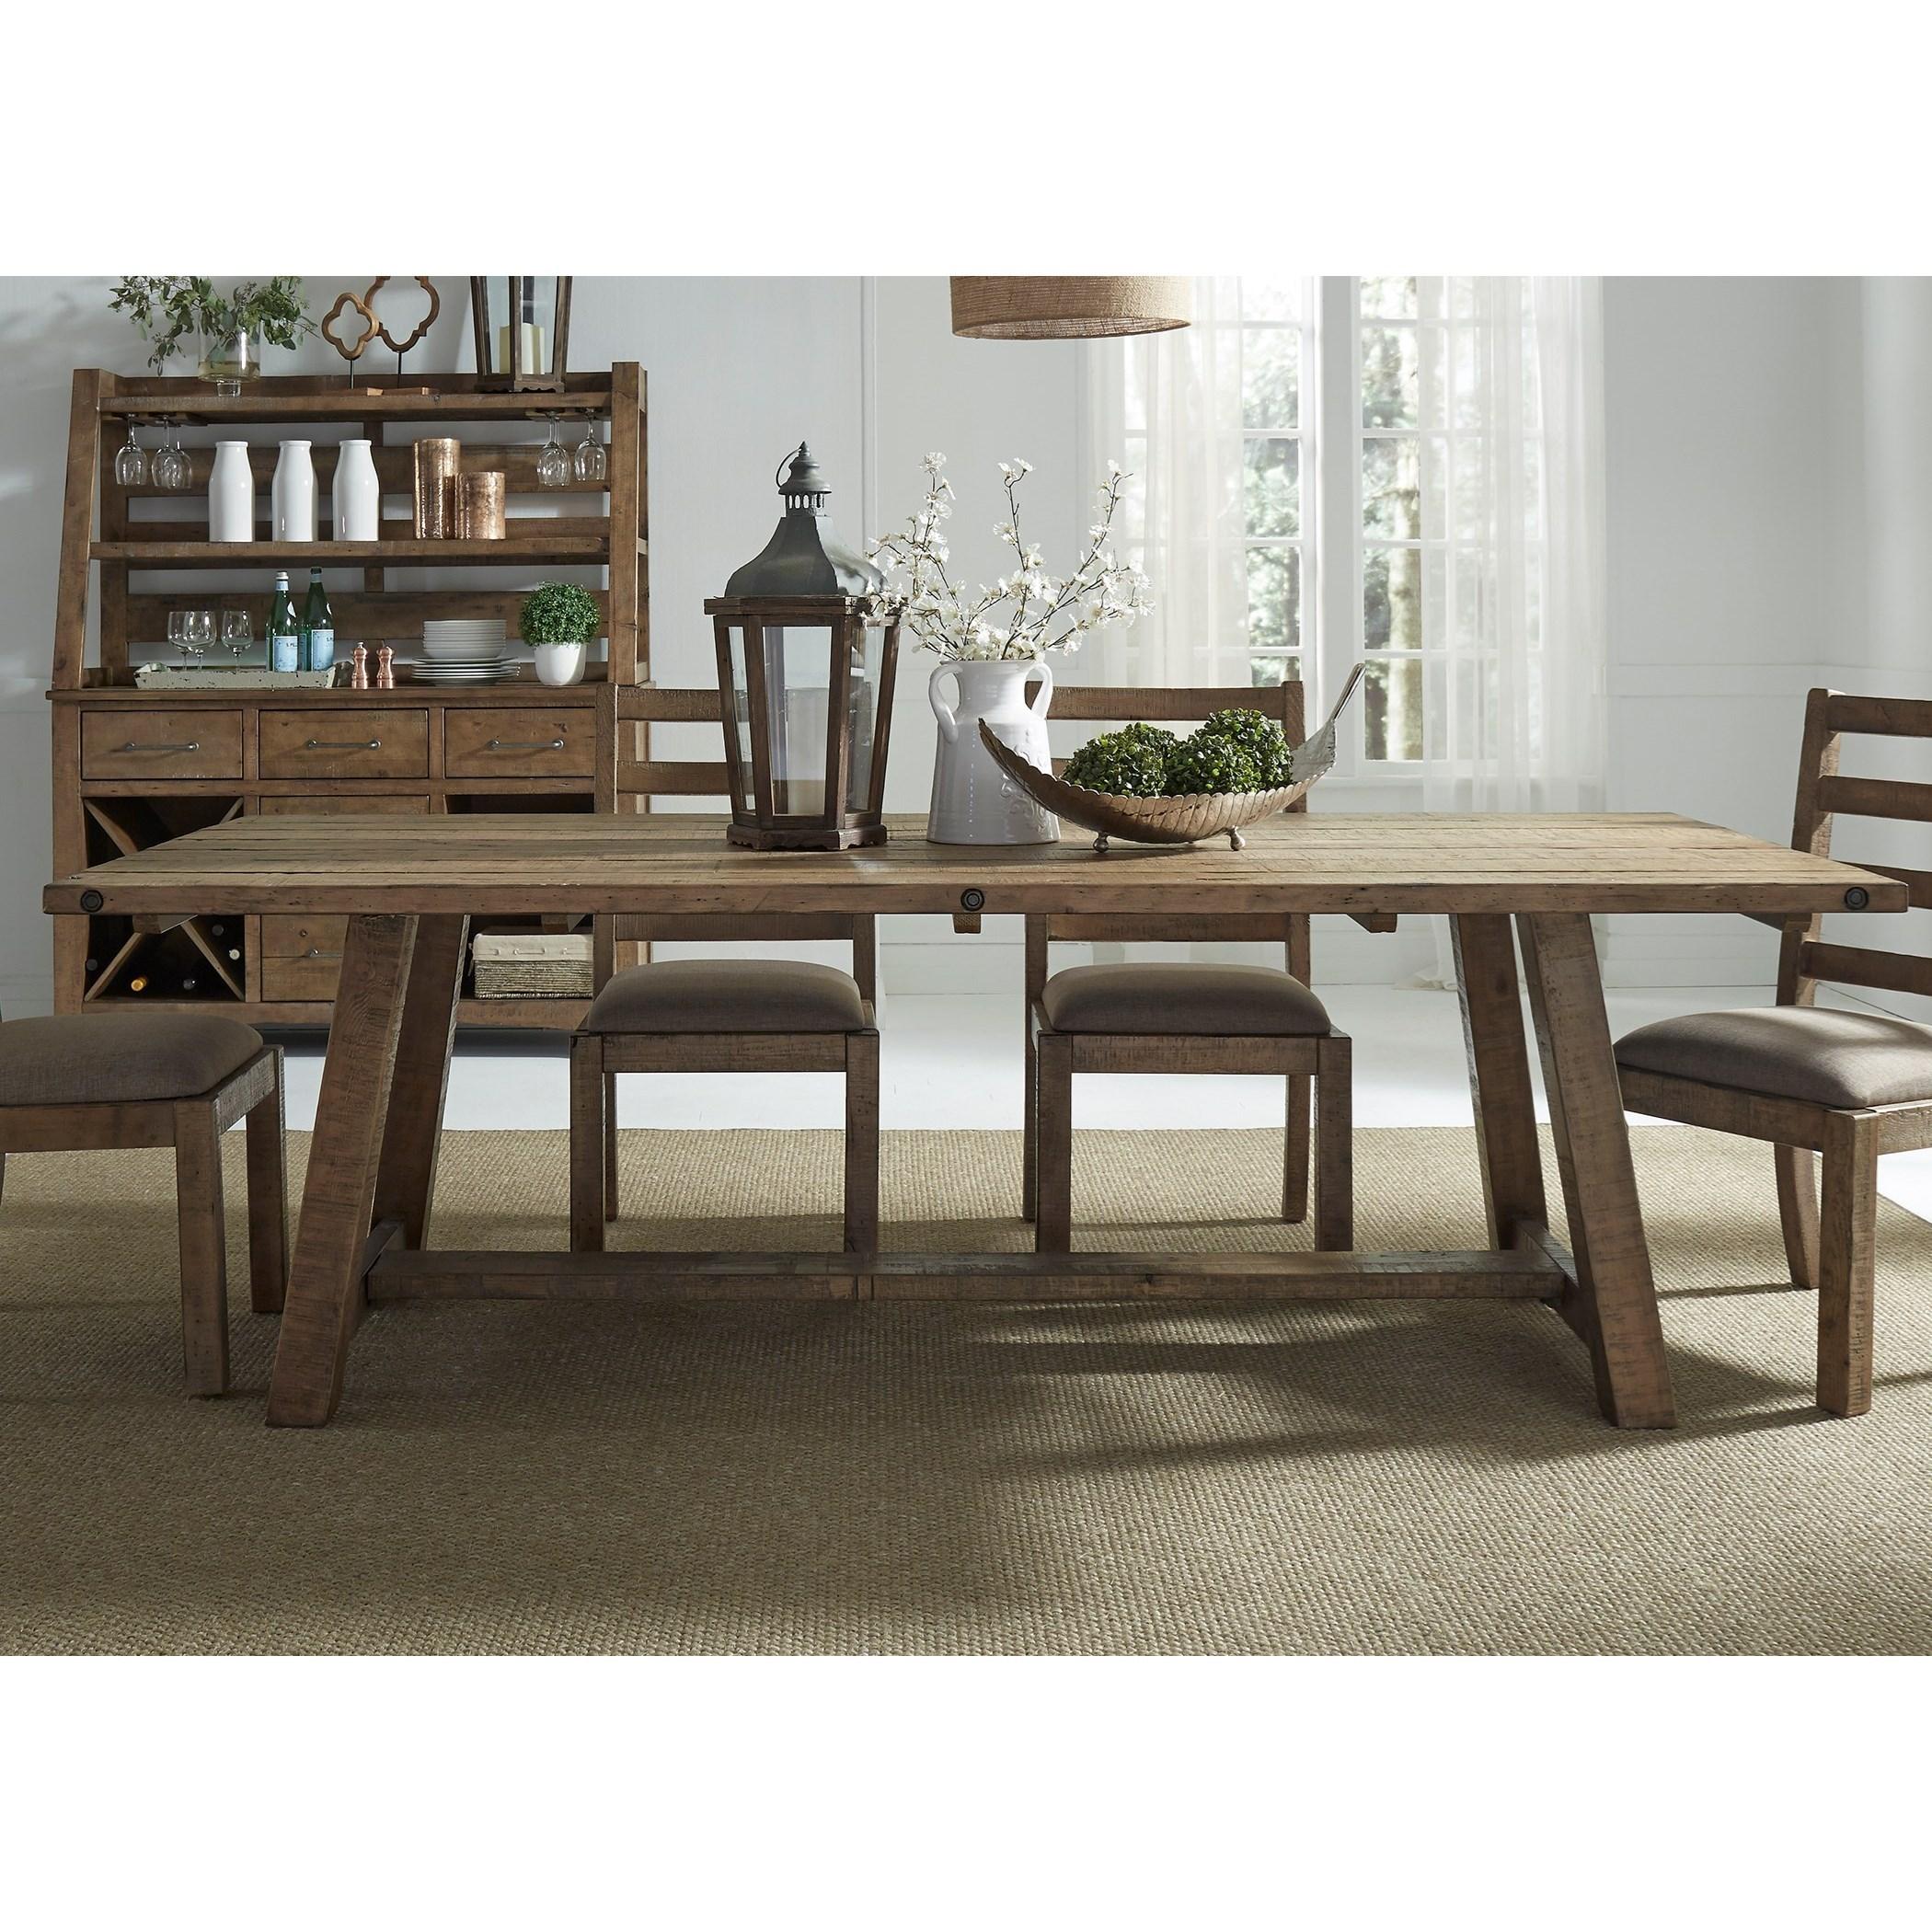 Vendor 5349 Prescott Valley Dining Rustic Dining Table - Item Number: 178-P4296+T4296